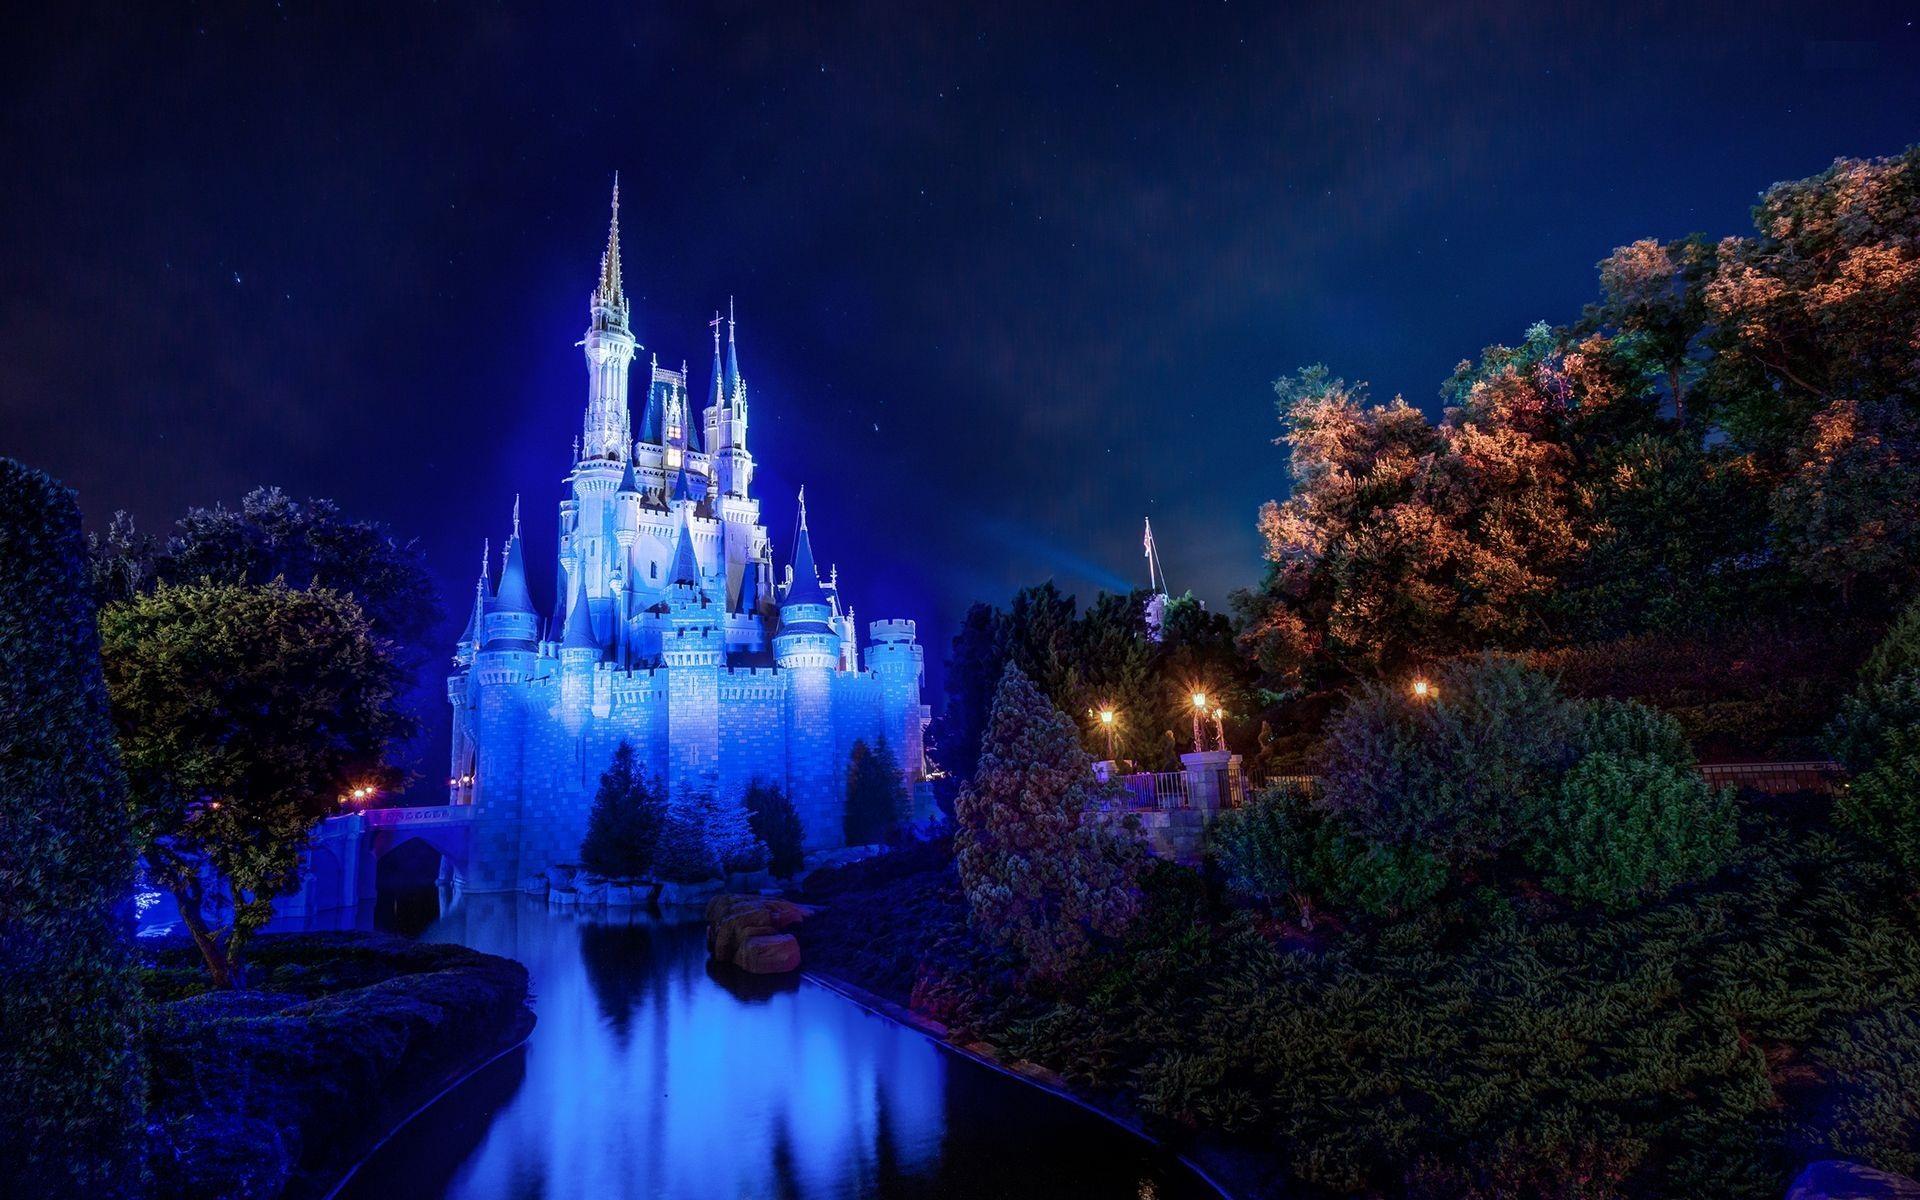 Disney world background image hd desktop wallpaper wide 1920x1200